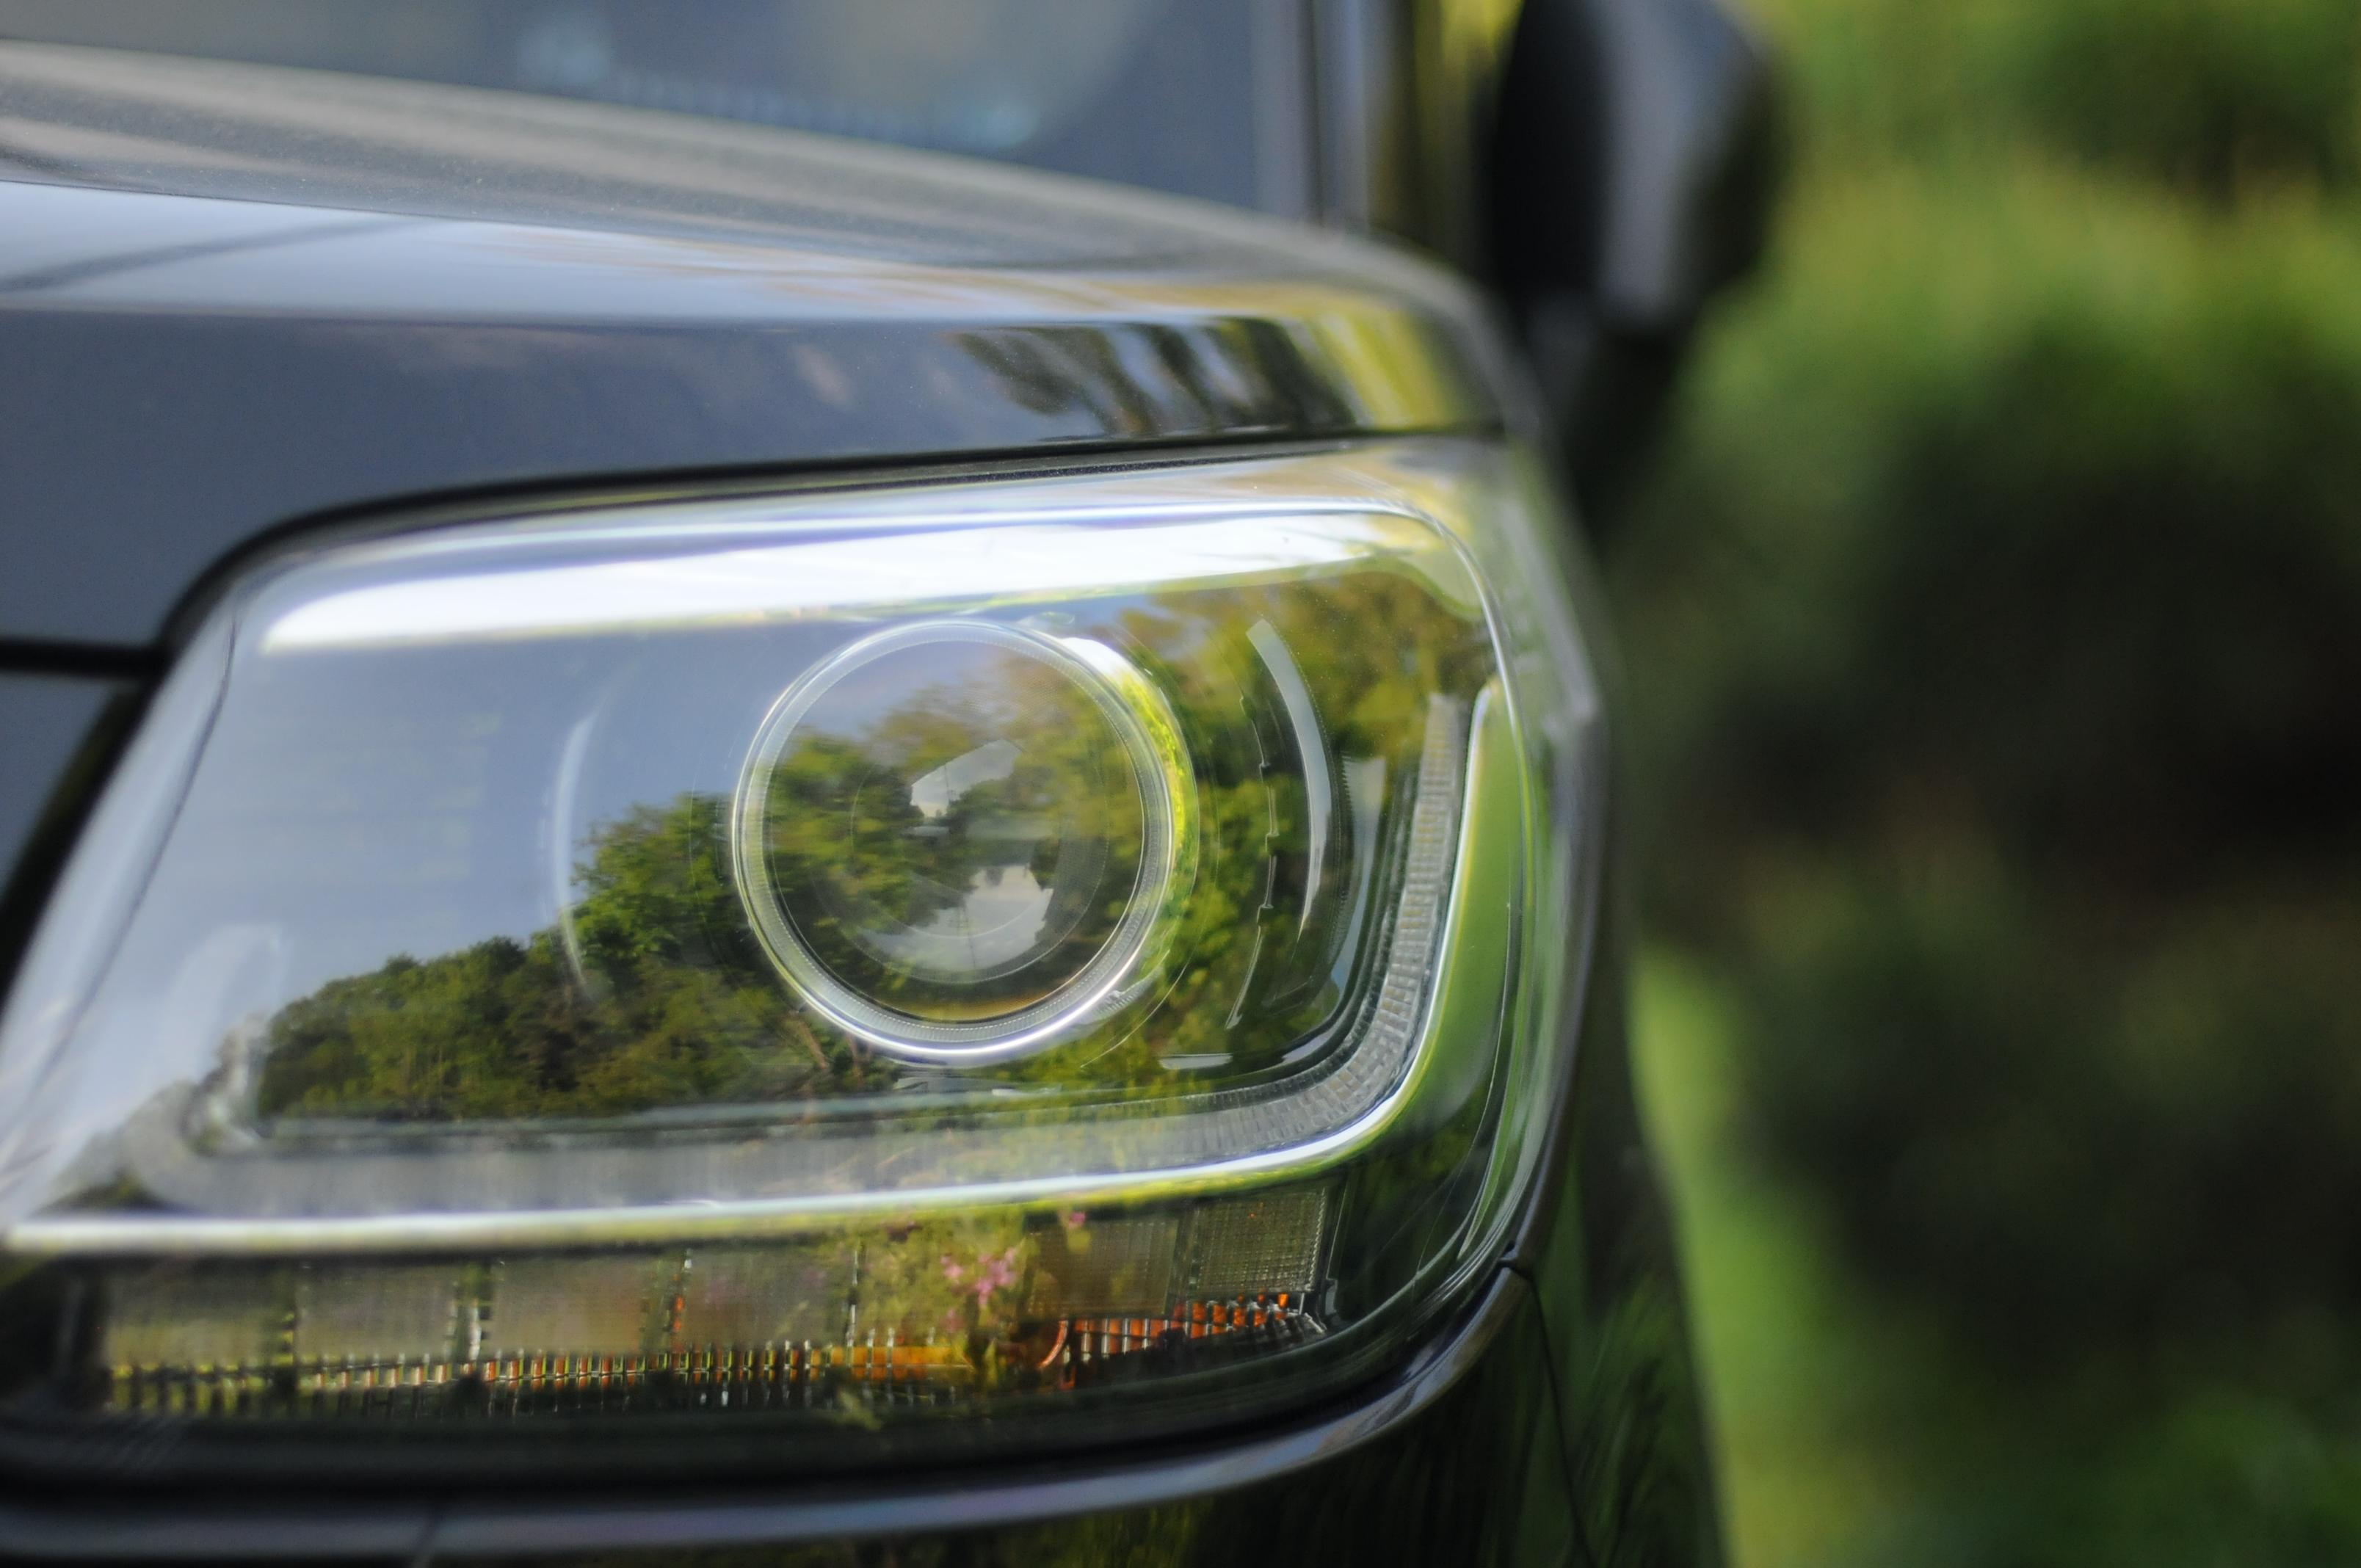 https://get.pxhere.com/photo/car-light-motor-vehicle-land-vehicle-vehicle-automotive-lighting-headlamp-automotive-design-automotive-exterior-family-car-glass-auto-part-mid-size-car-sedan-bumper-sport-utility-vehicle-wheel-executive-car-1432575.jpg